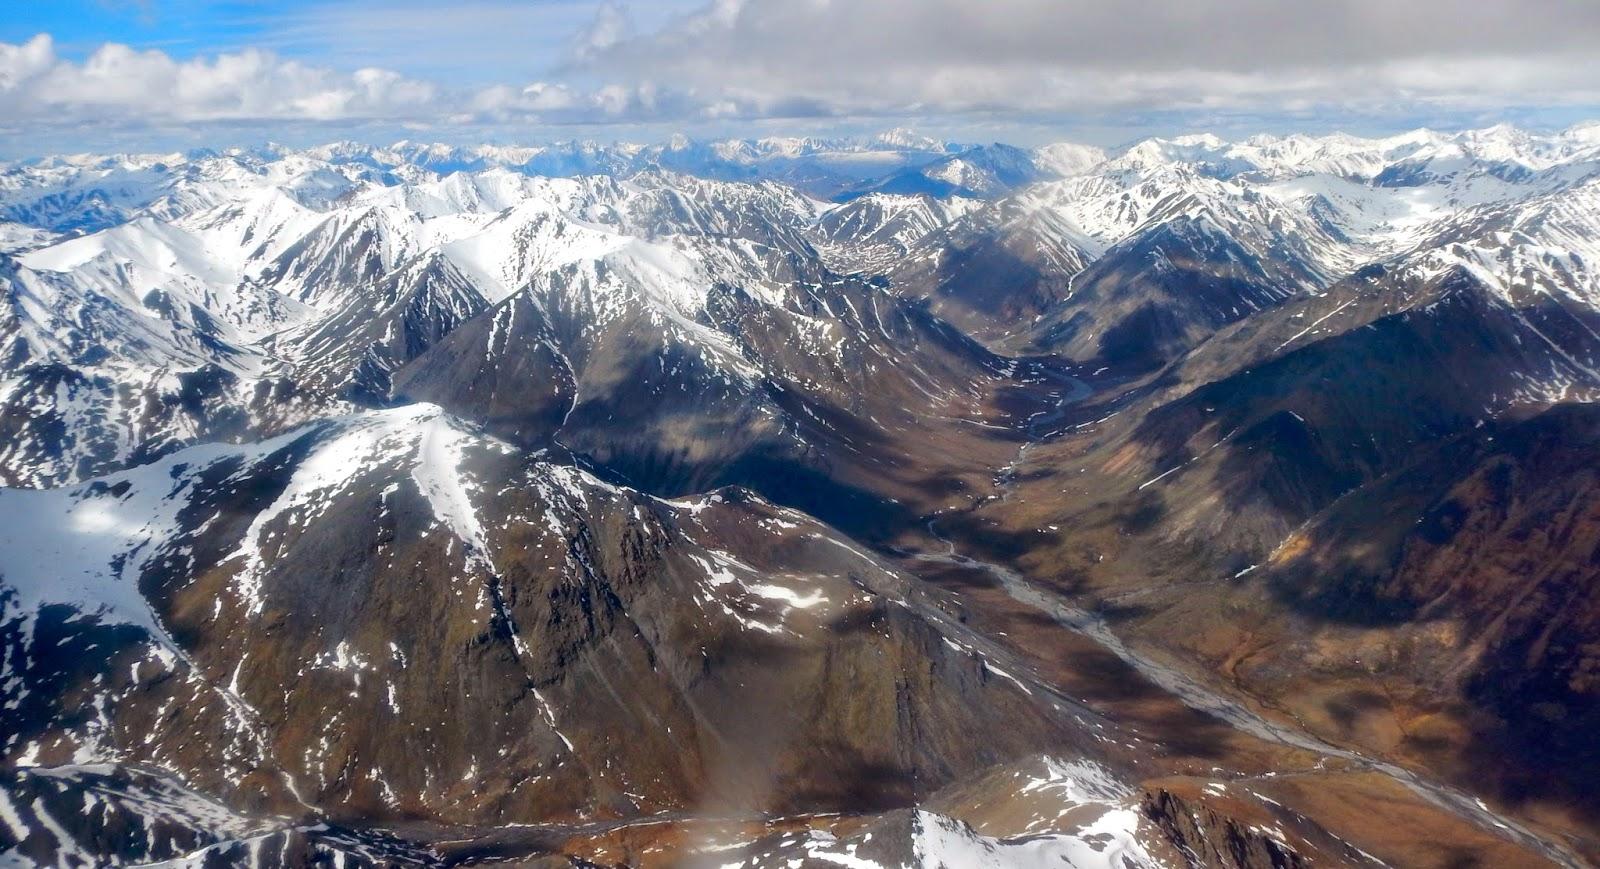 Brooks Mountain Range Alaska HD Free Wallpapers - brooks mountain range alaska wallpapers